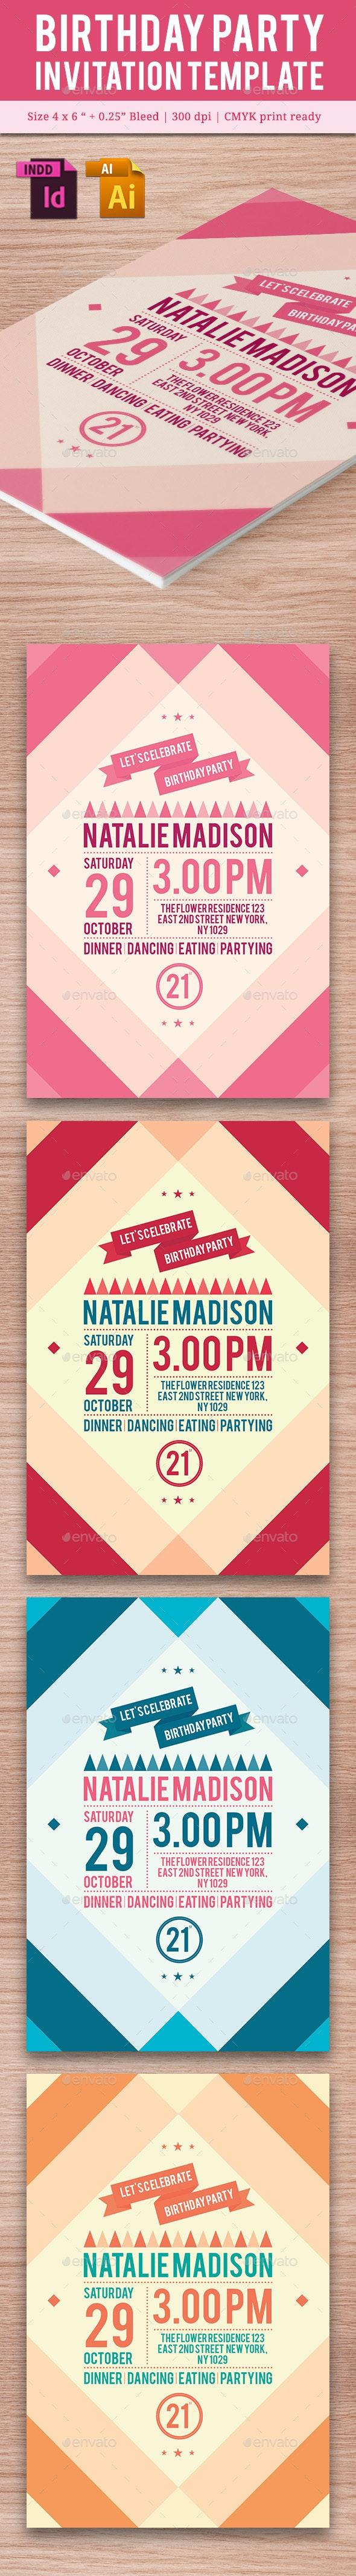 Birthday Party Invitation Template - Vol . 11 - Cards & Invites Print Templates